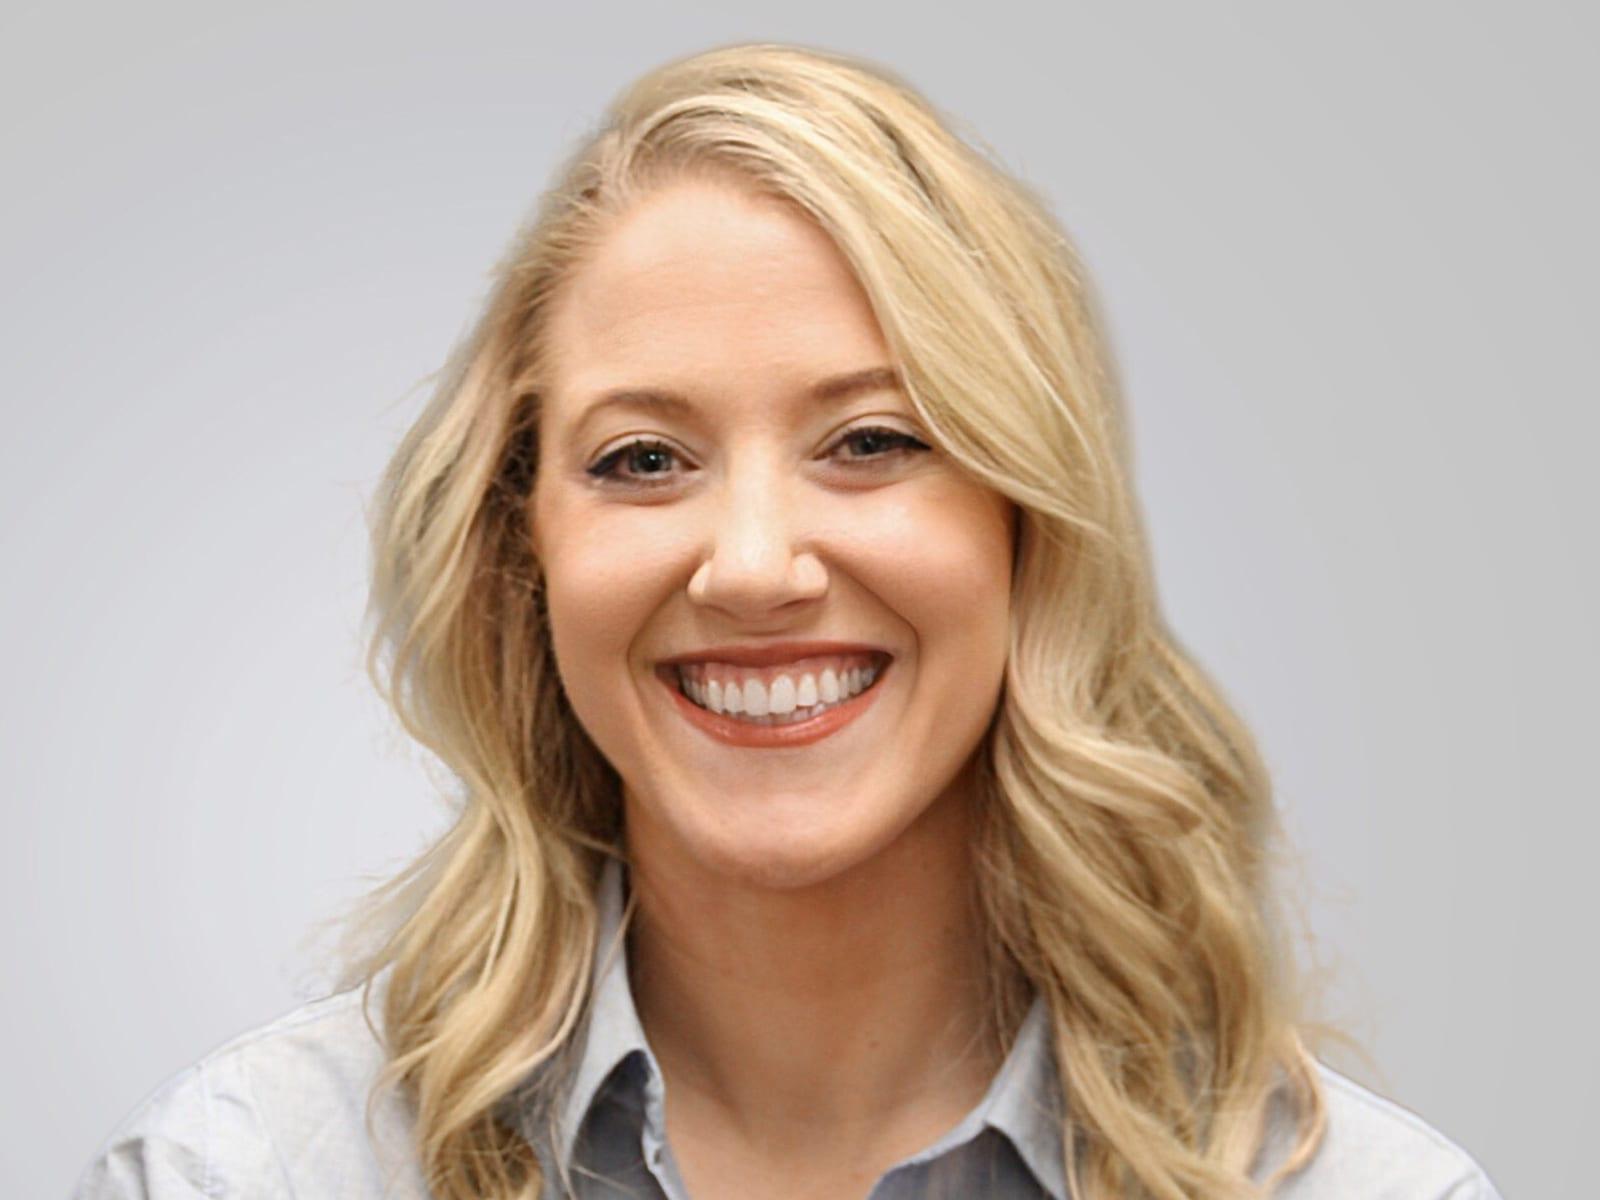 Megan Simon